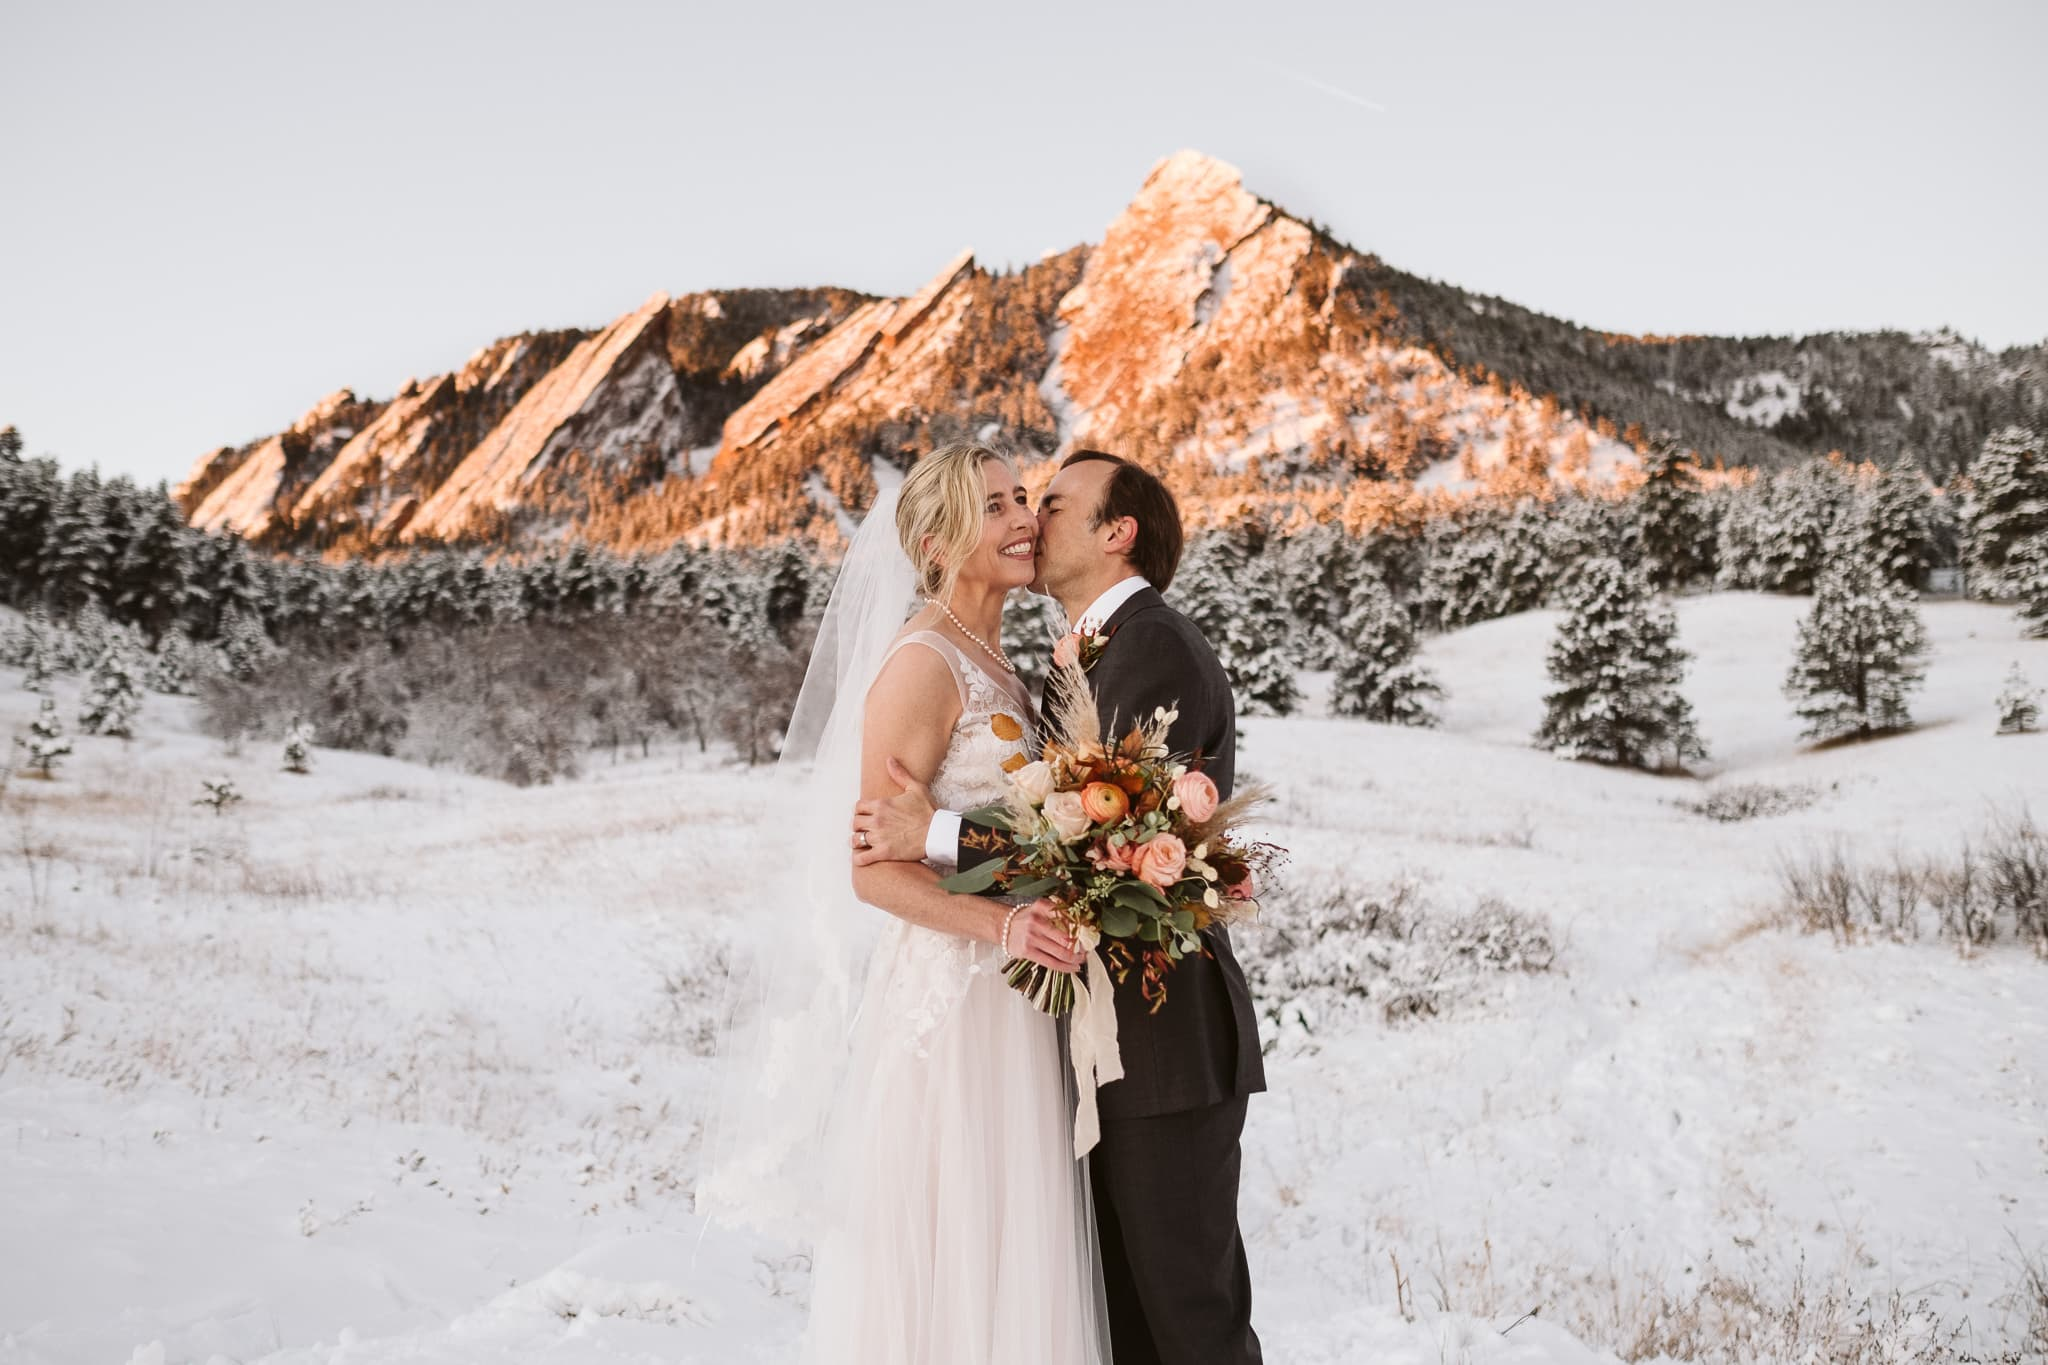 Chautauqua Park elopement in Boulder